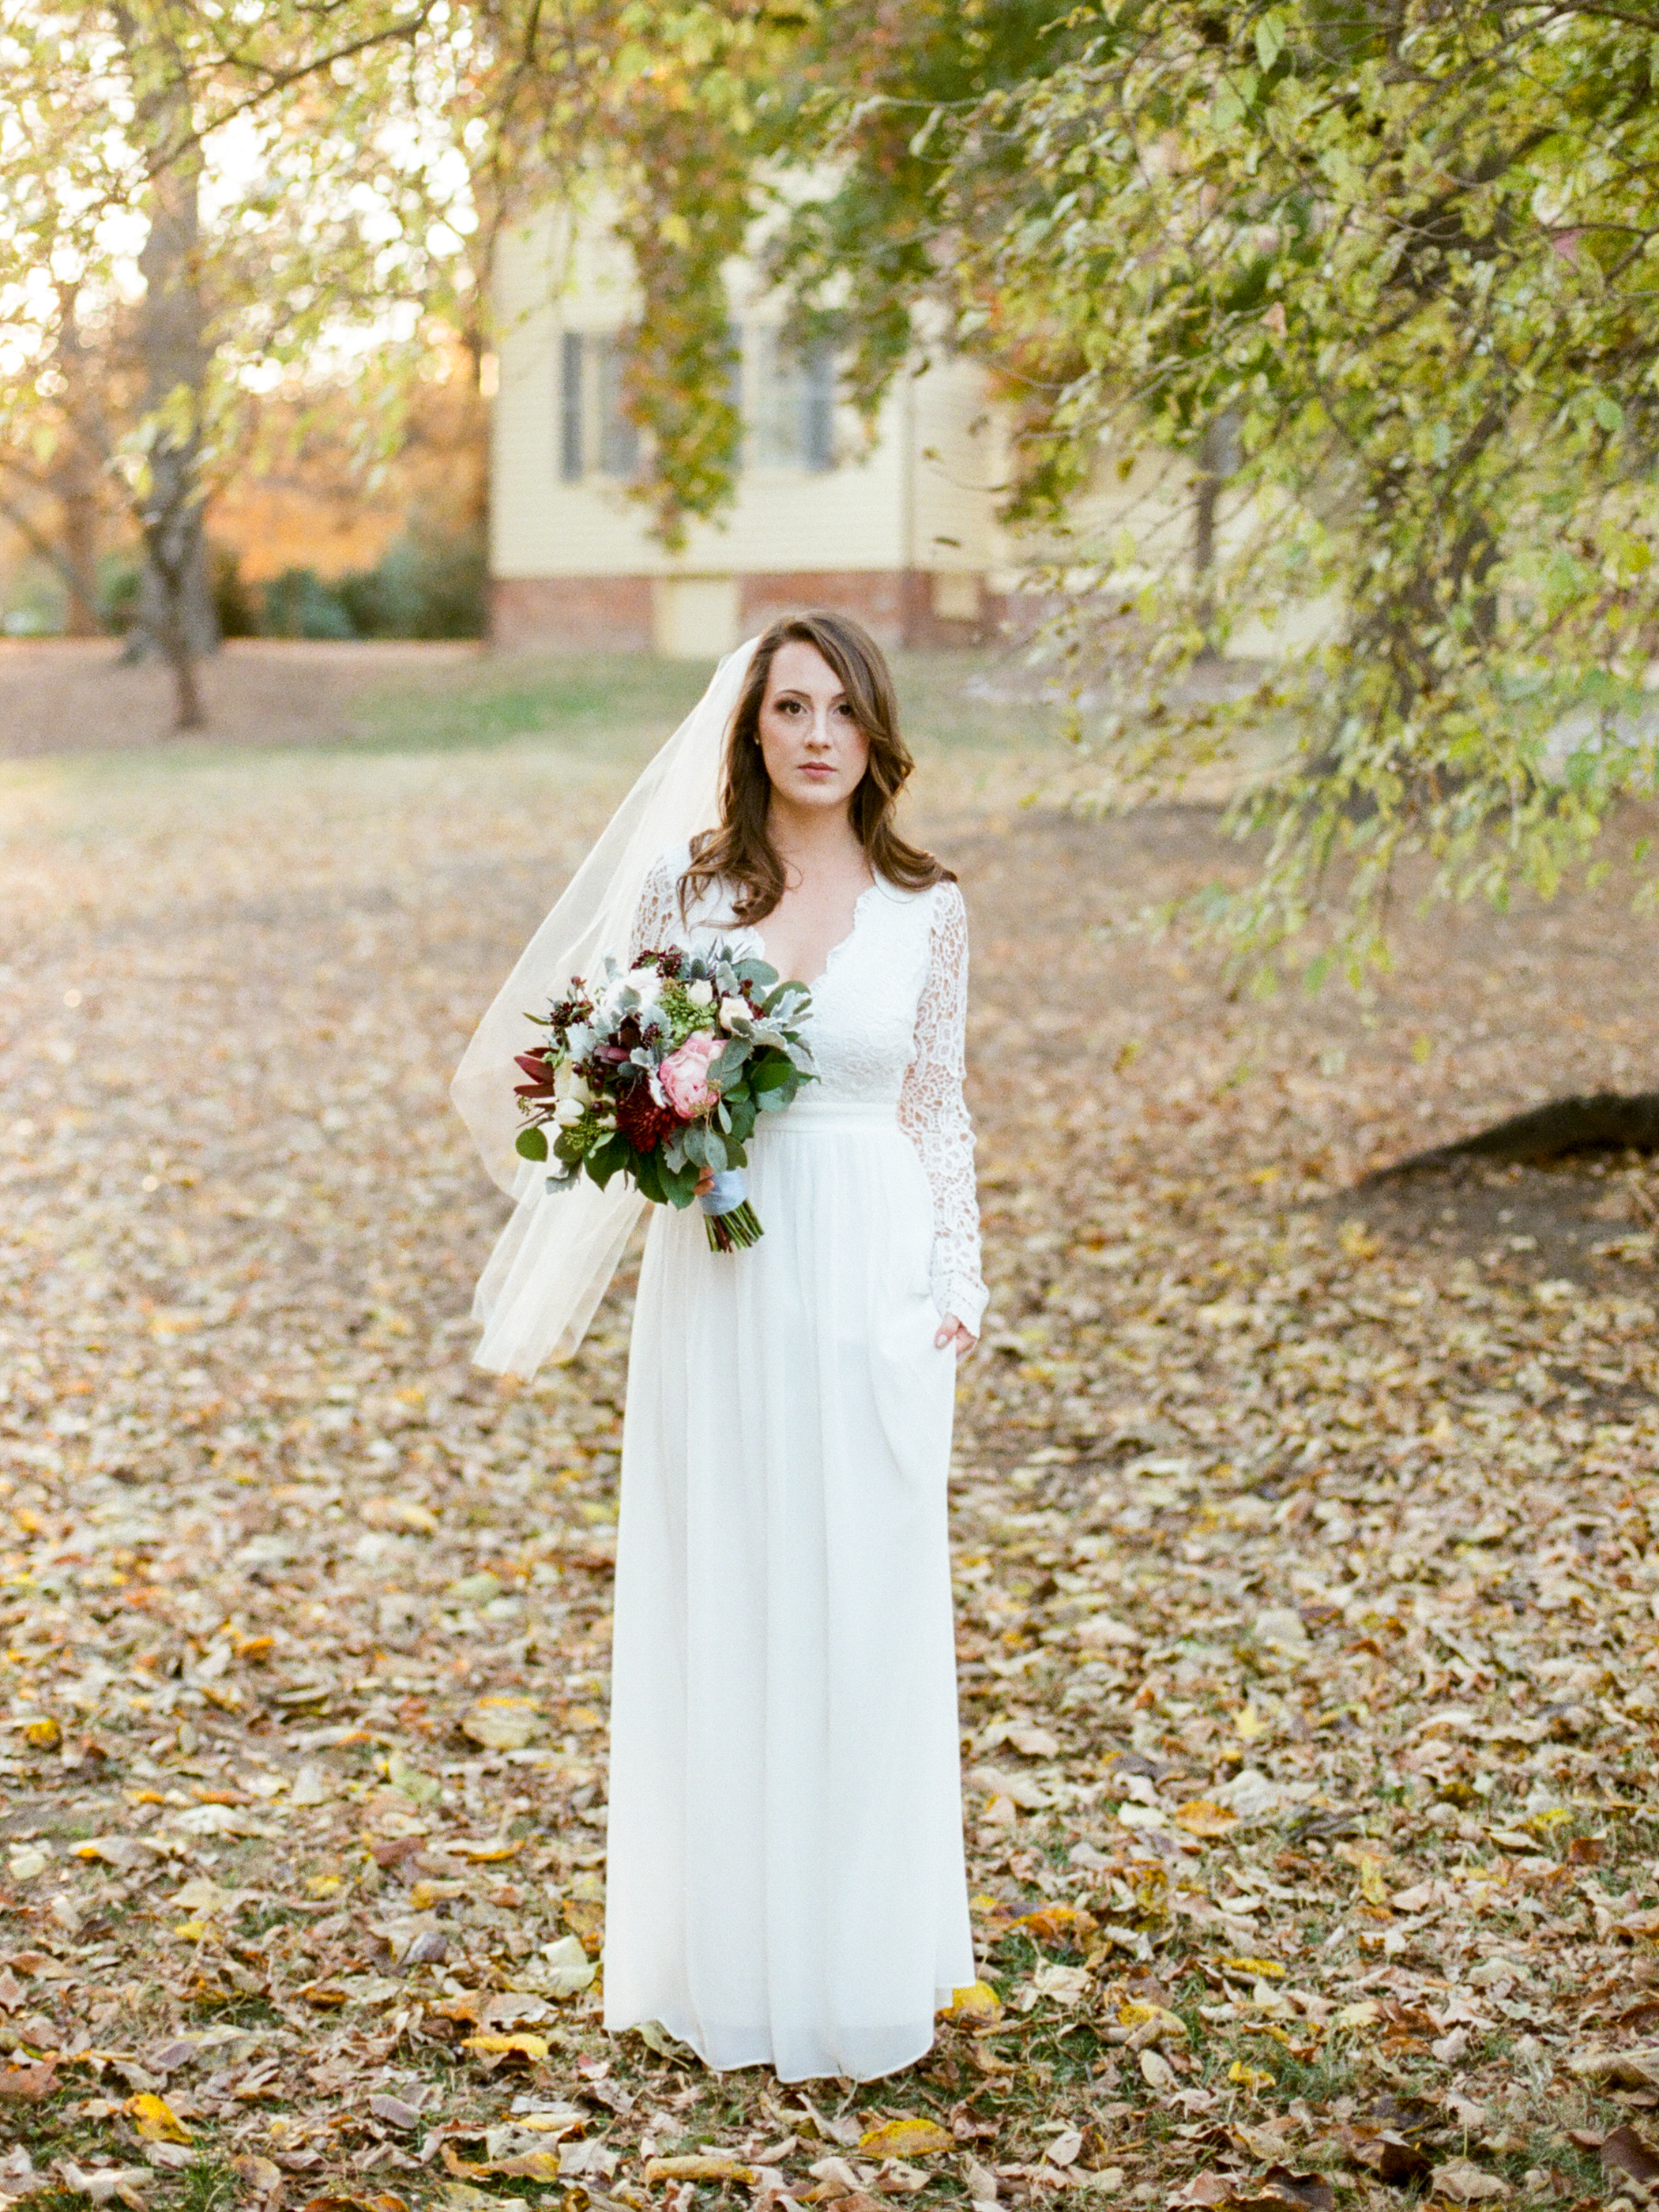 alternative wedding dress ideas, wedding dress options, non traditional wedding dress options